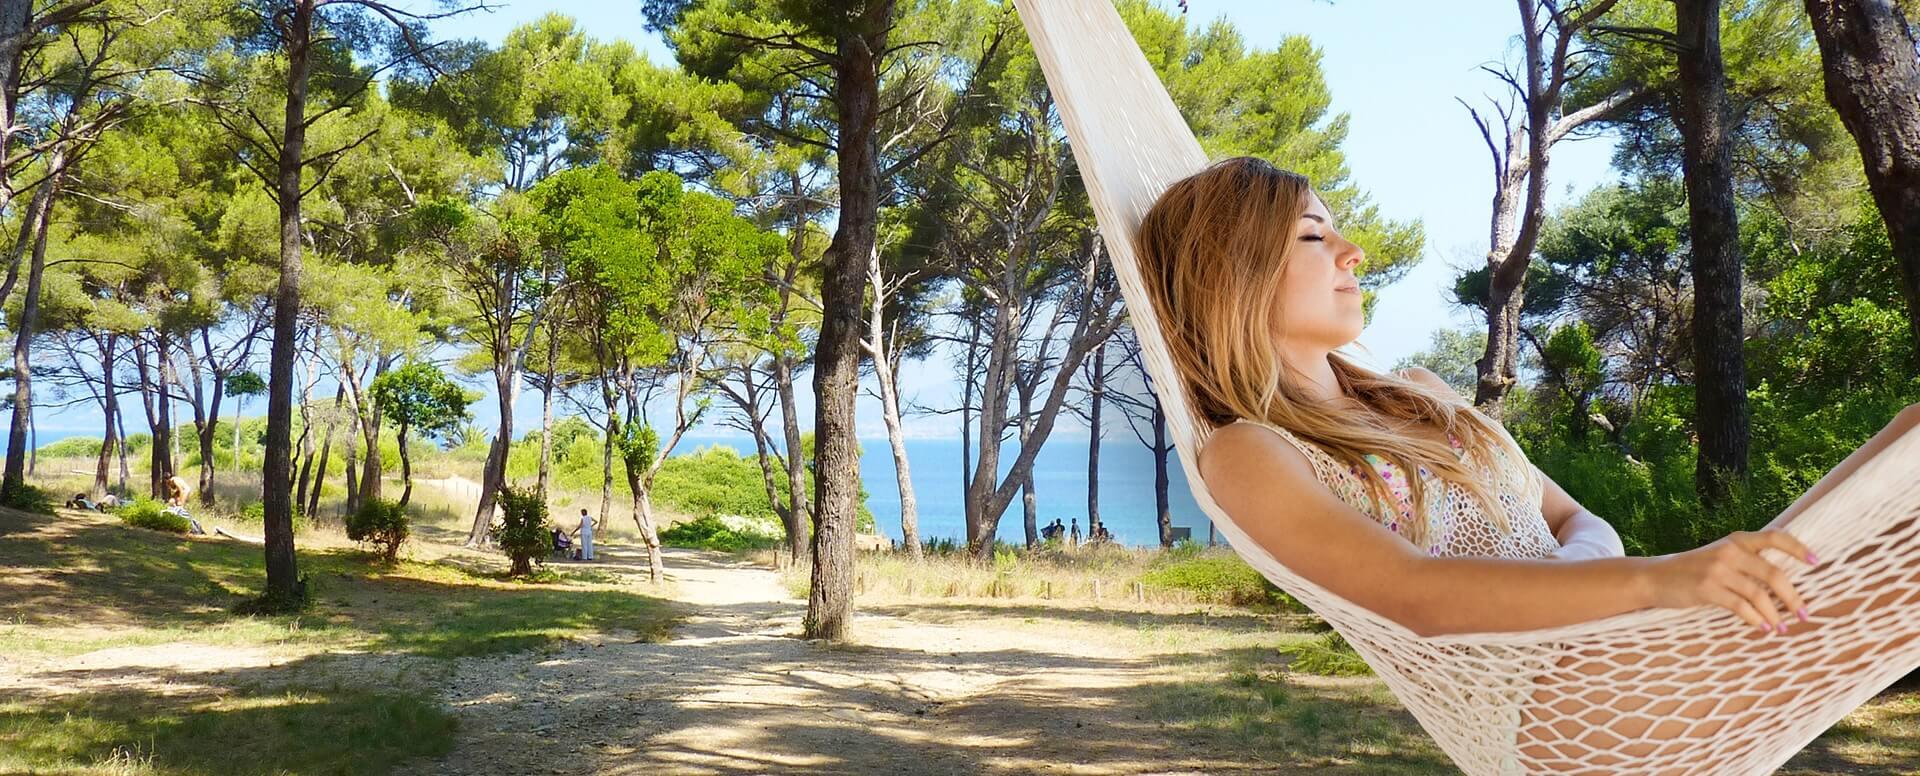 camping-olbia-vacances-nature-bord-de-mer-1920xauto_0_1